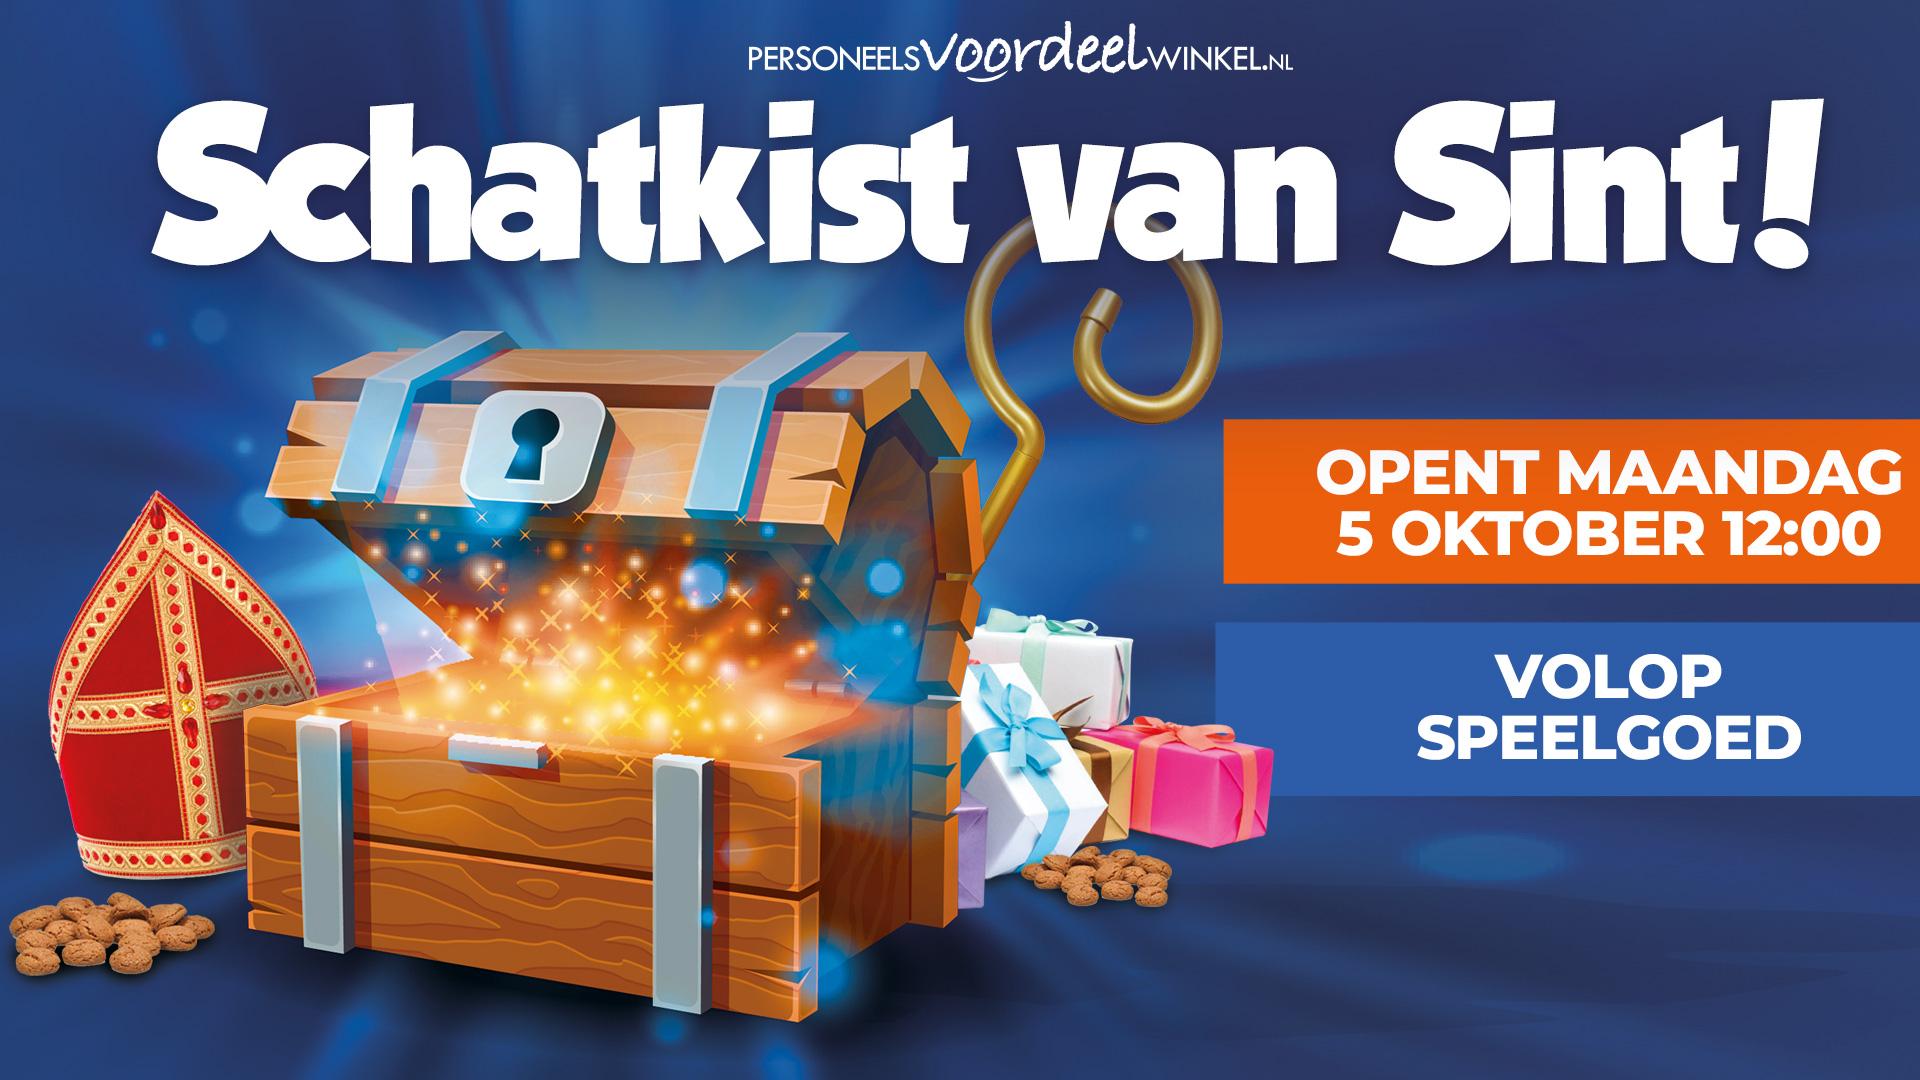 nc_schatkist_van_sint_1920x1080_nl_horizontaal